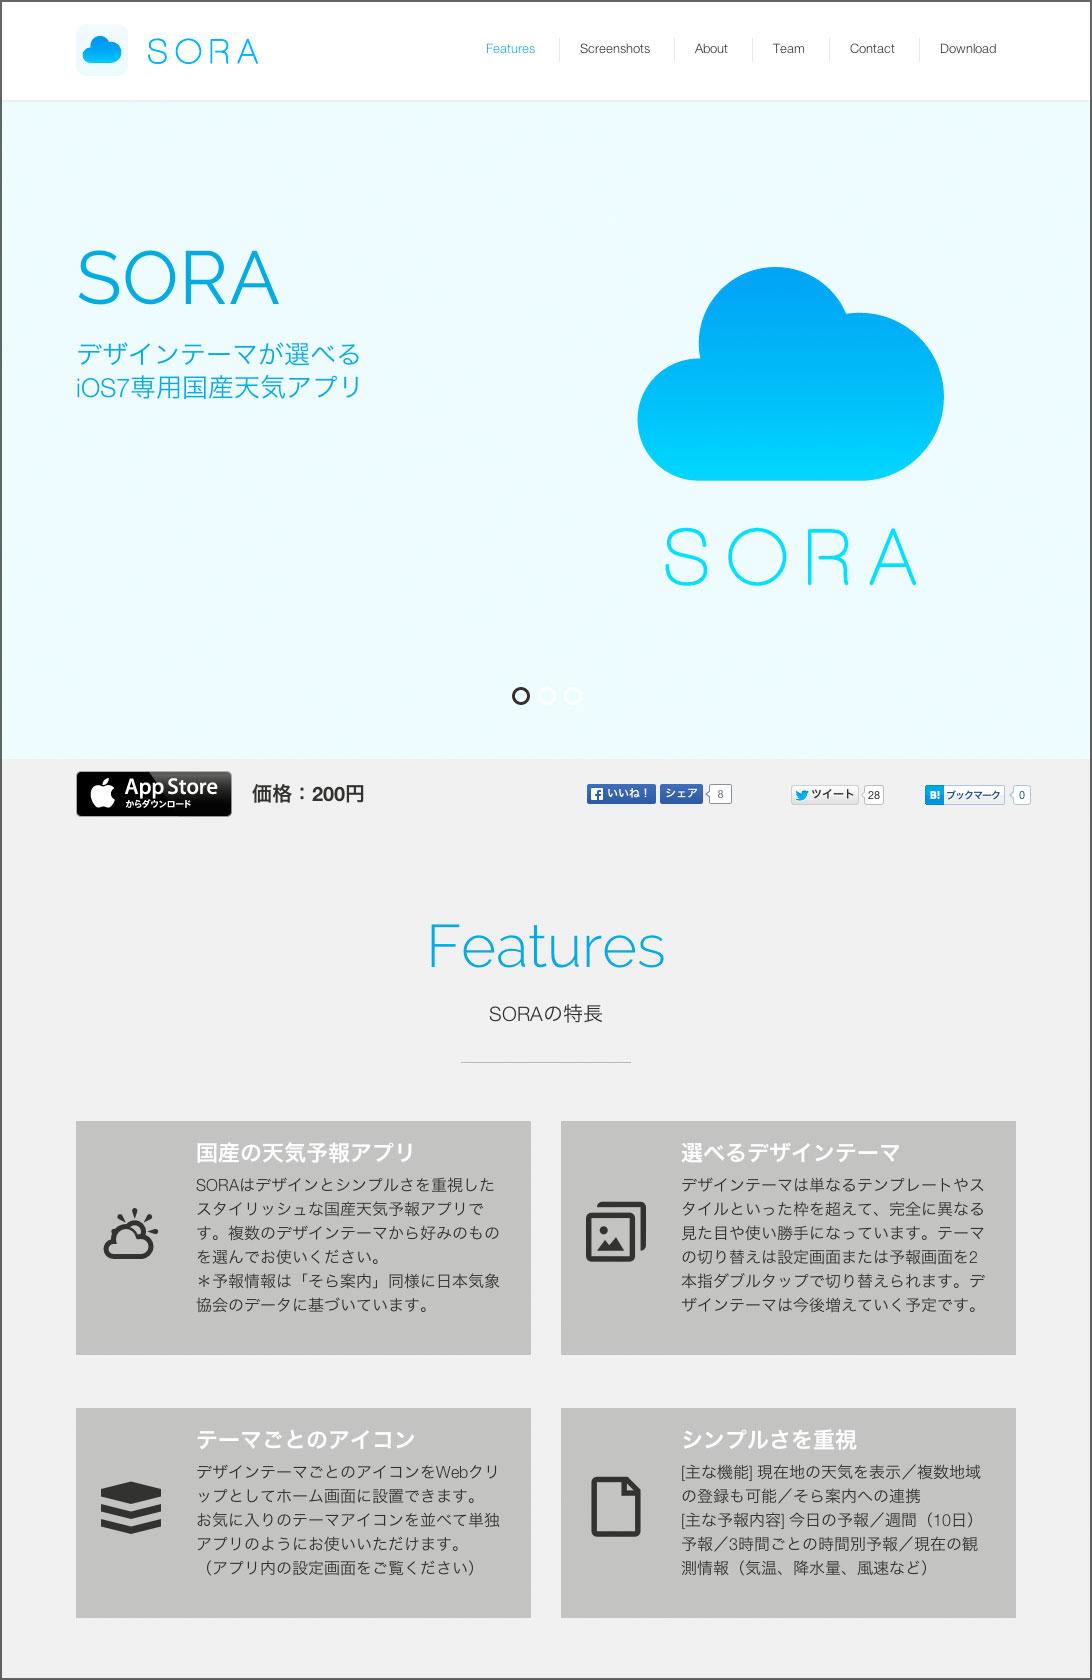 SORAアプリ プロモーションサイト